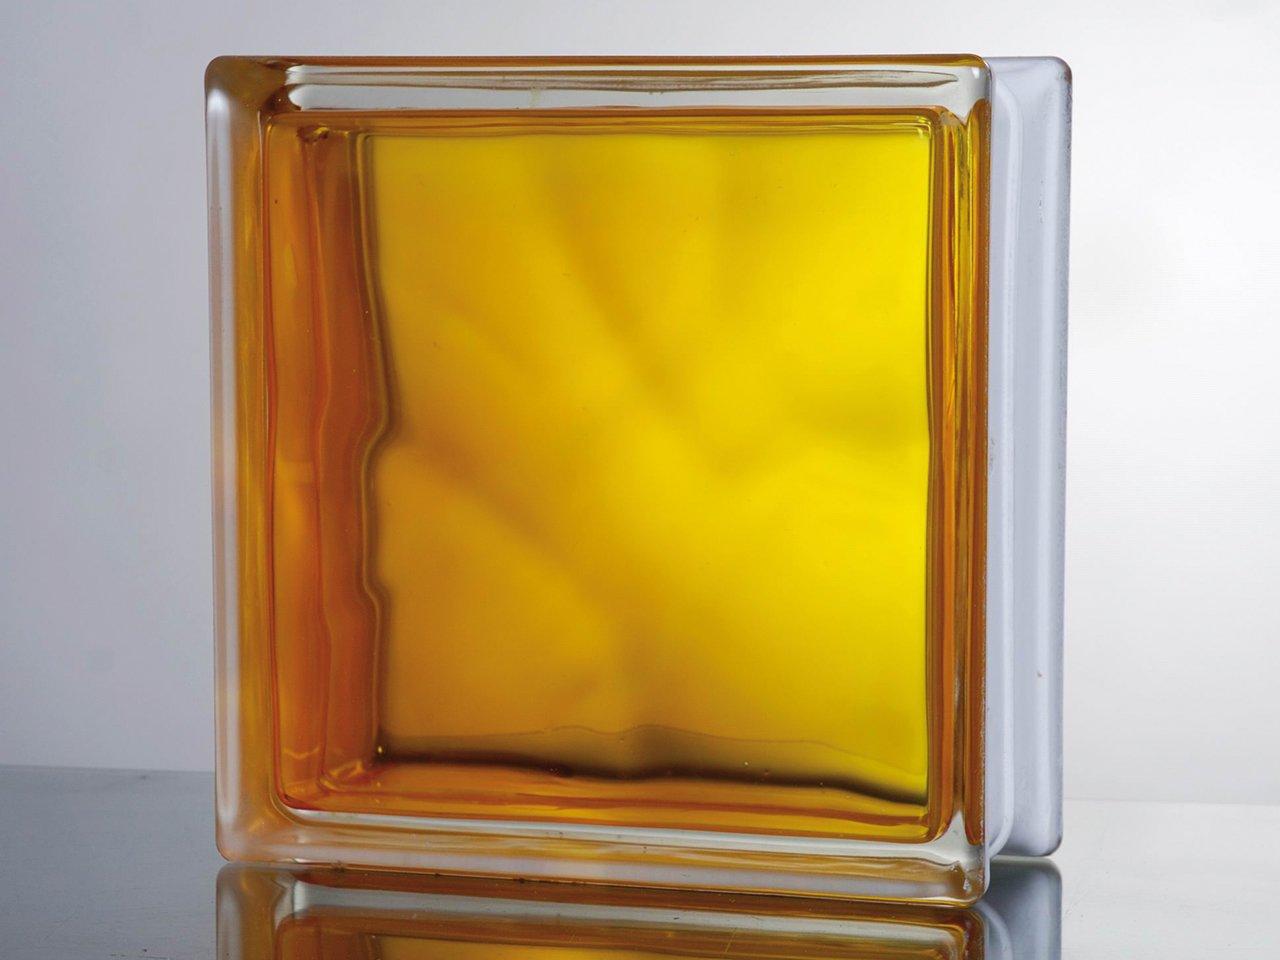 Vetromat in colored yellow 19x19x8 iperceramica - Piastrelle vetrocemento ...